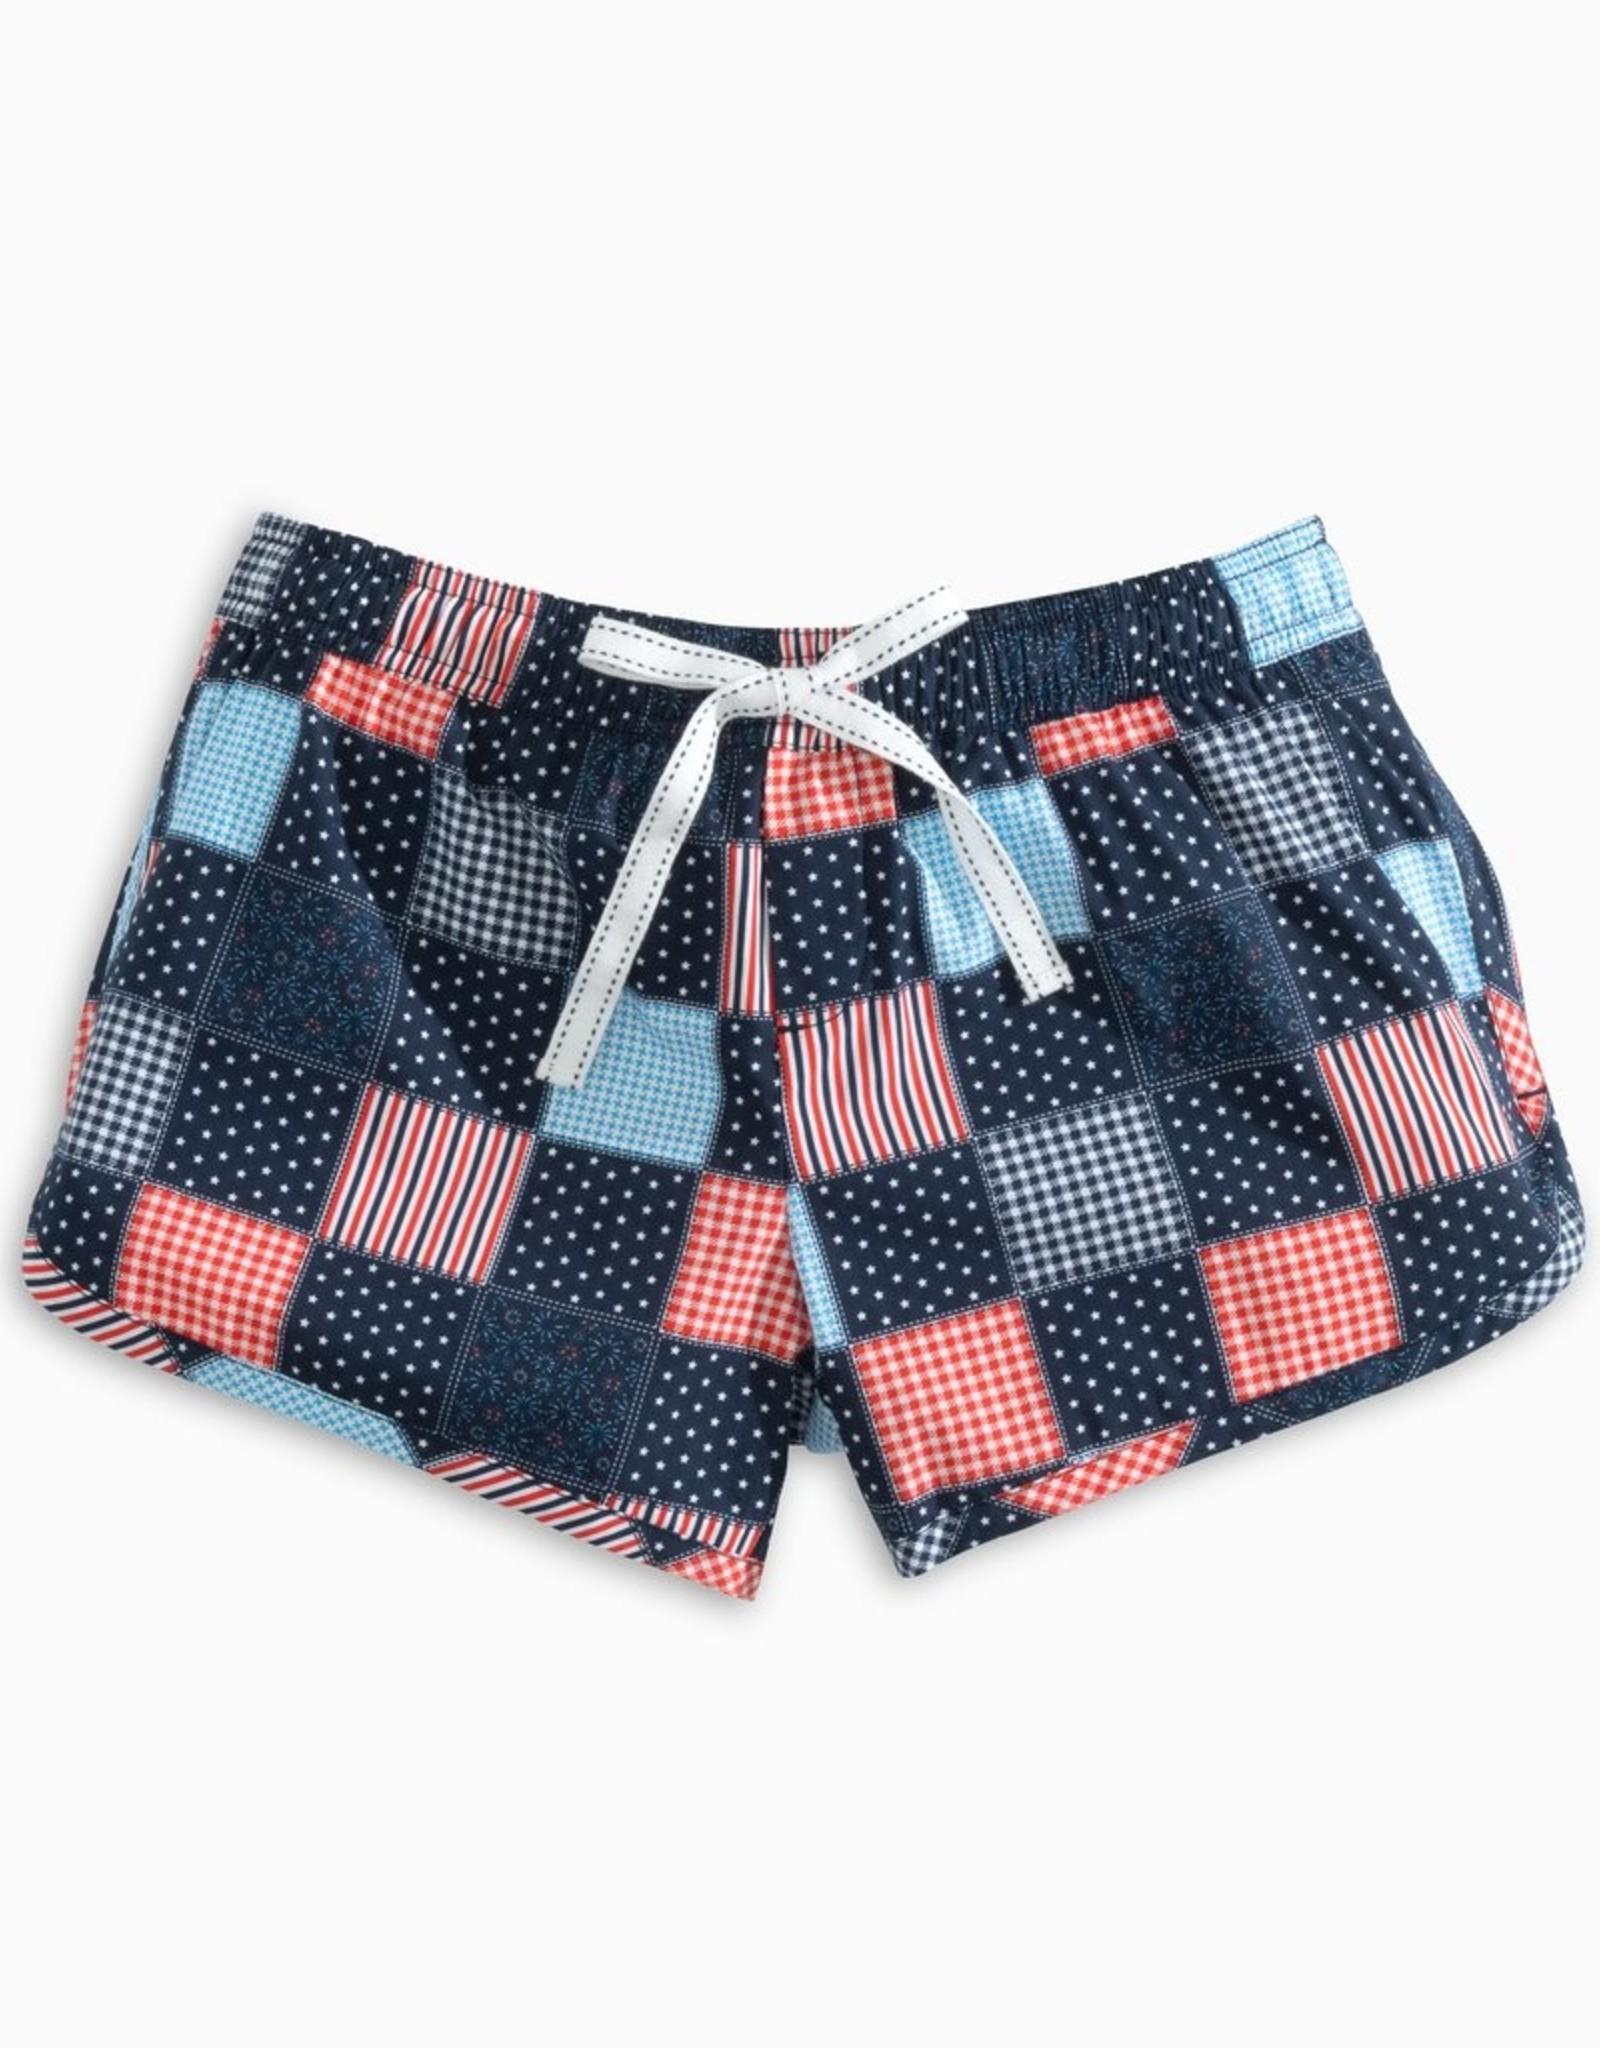 Southern Tide USA Patchwork Lounge Shorts